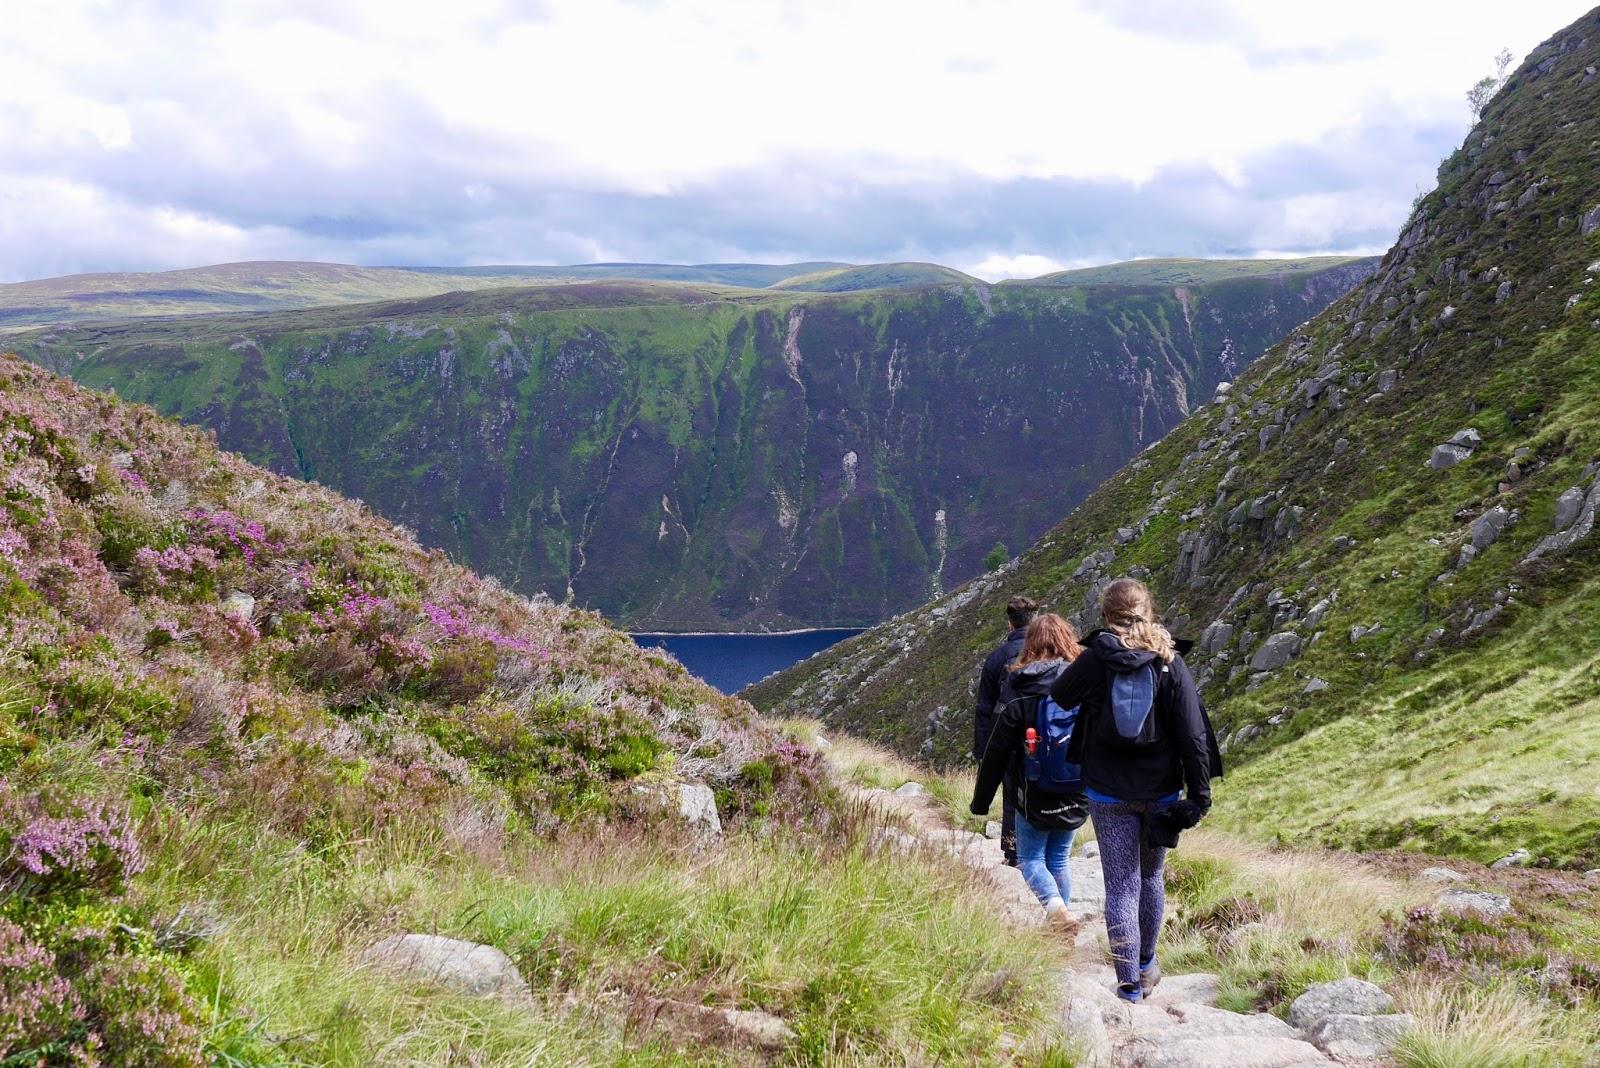 group hiking the Scottish mountains, Lochnagar Munro - Cal McTravel - www.calmctravels.com